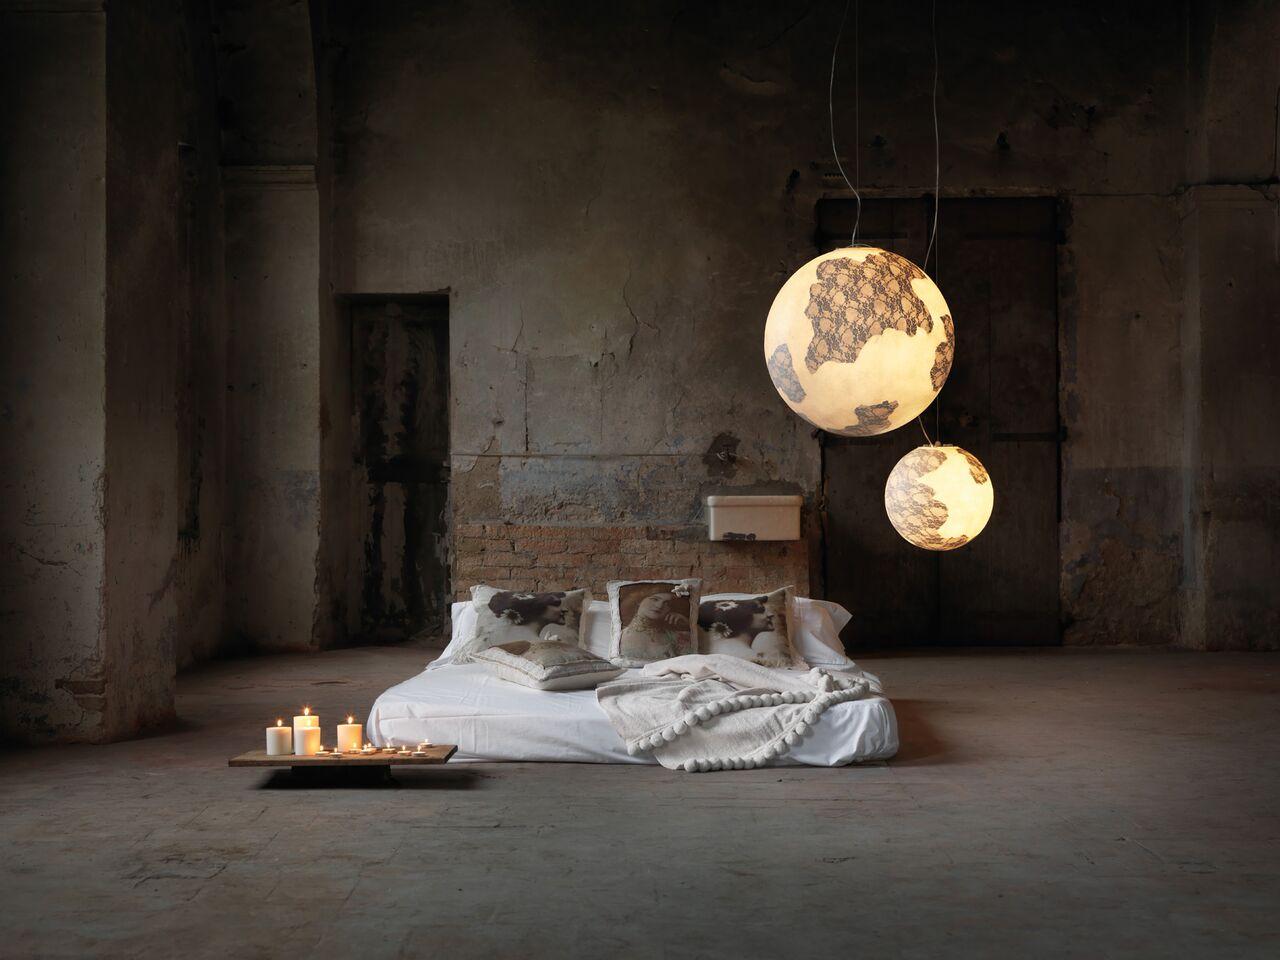 Lampade Per Porticati Esterni lampada ululì ululà - in vetroresina e pizzo per interni ed esterni